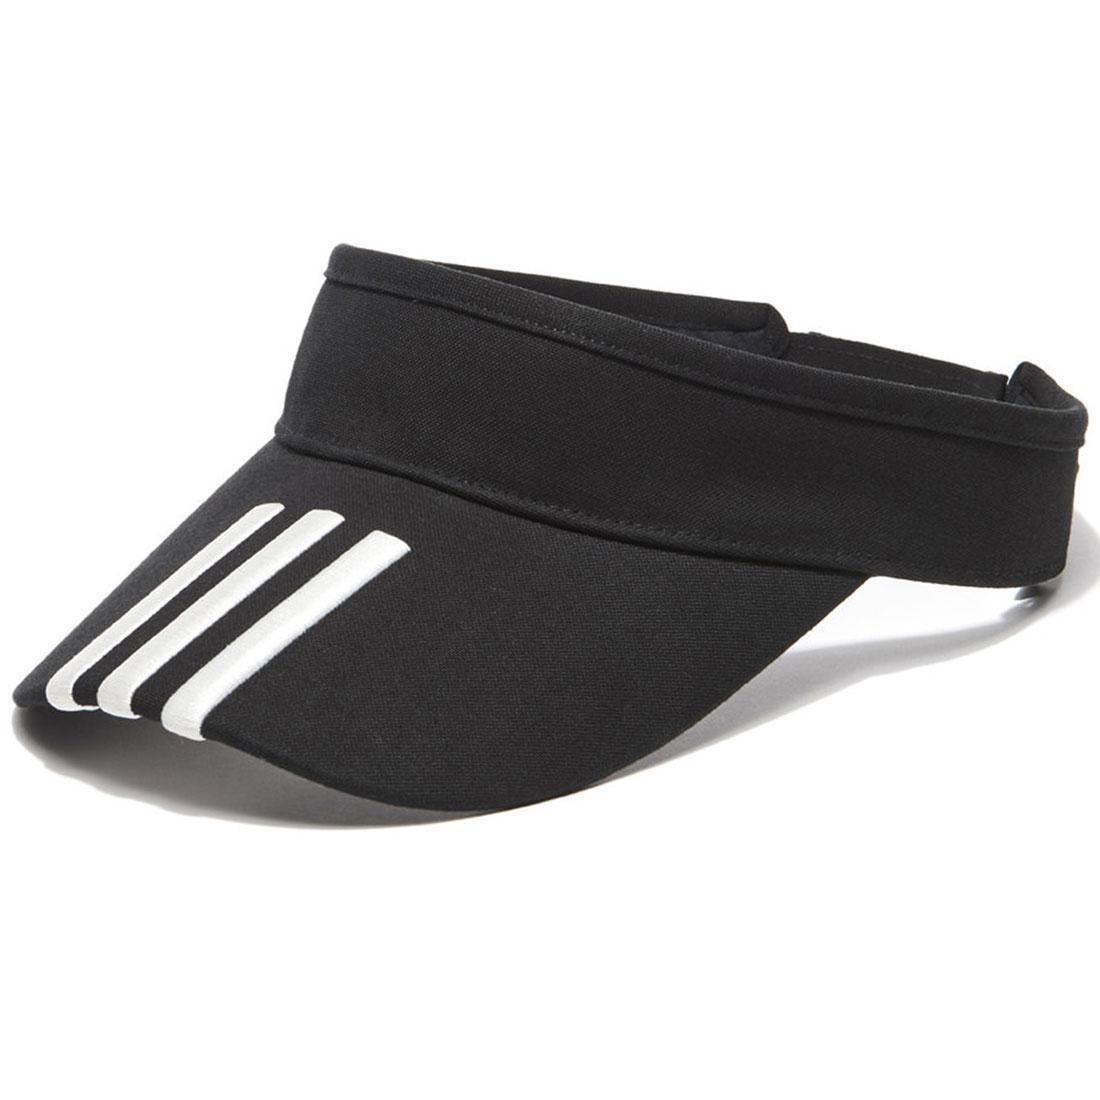 konkurencyjna cena dobry kup popularne Adidas Y-3 XL Visor (black / core white)